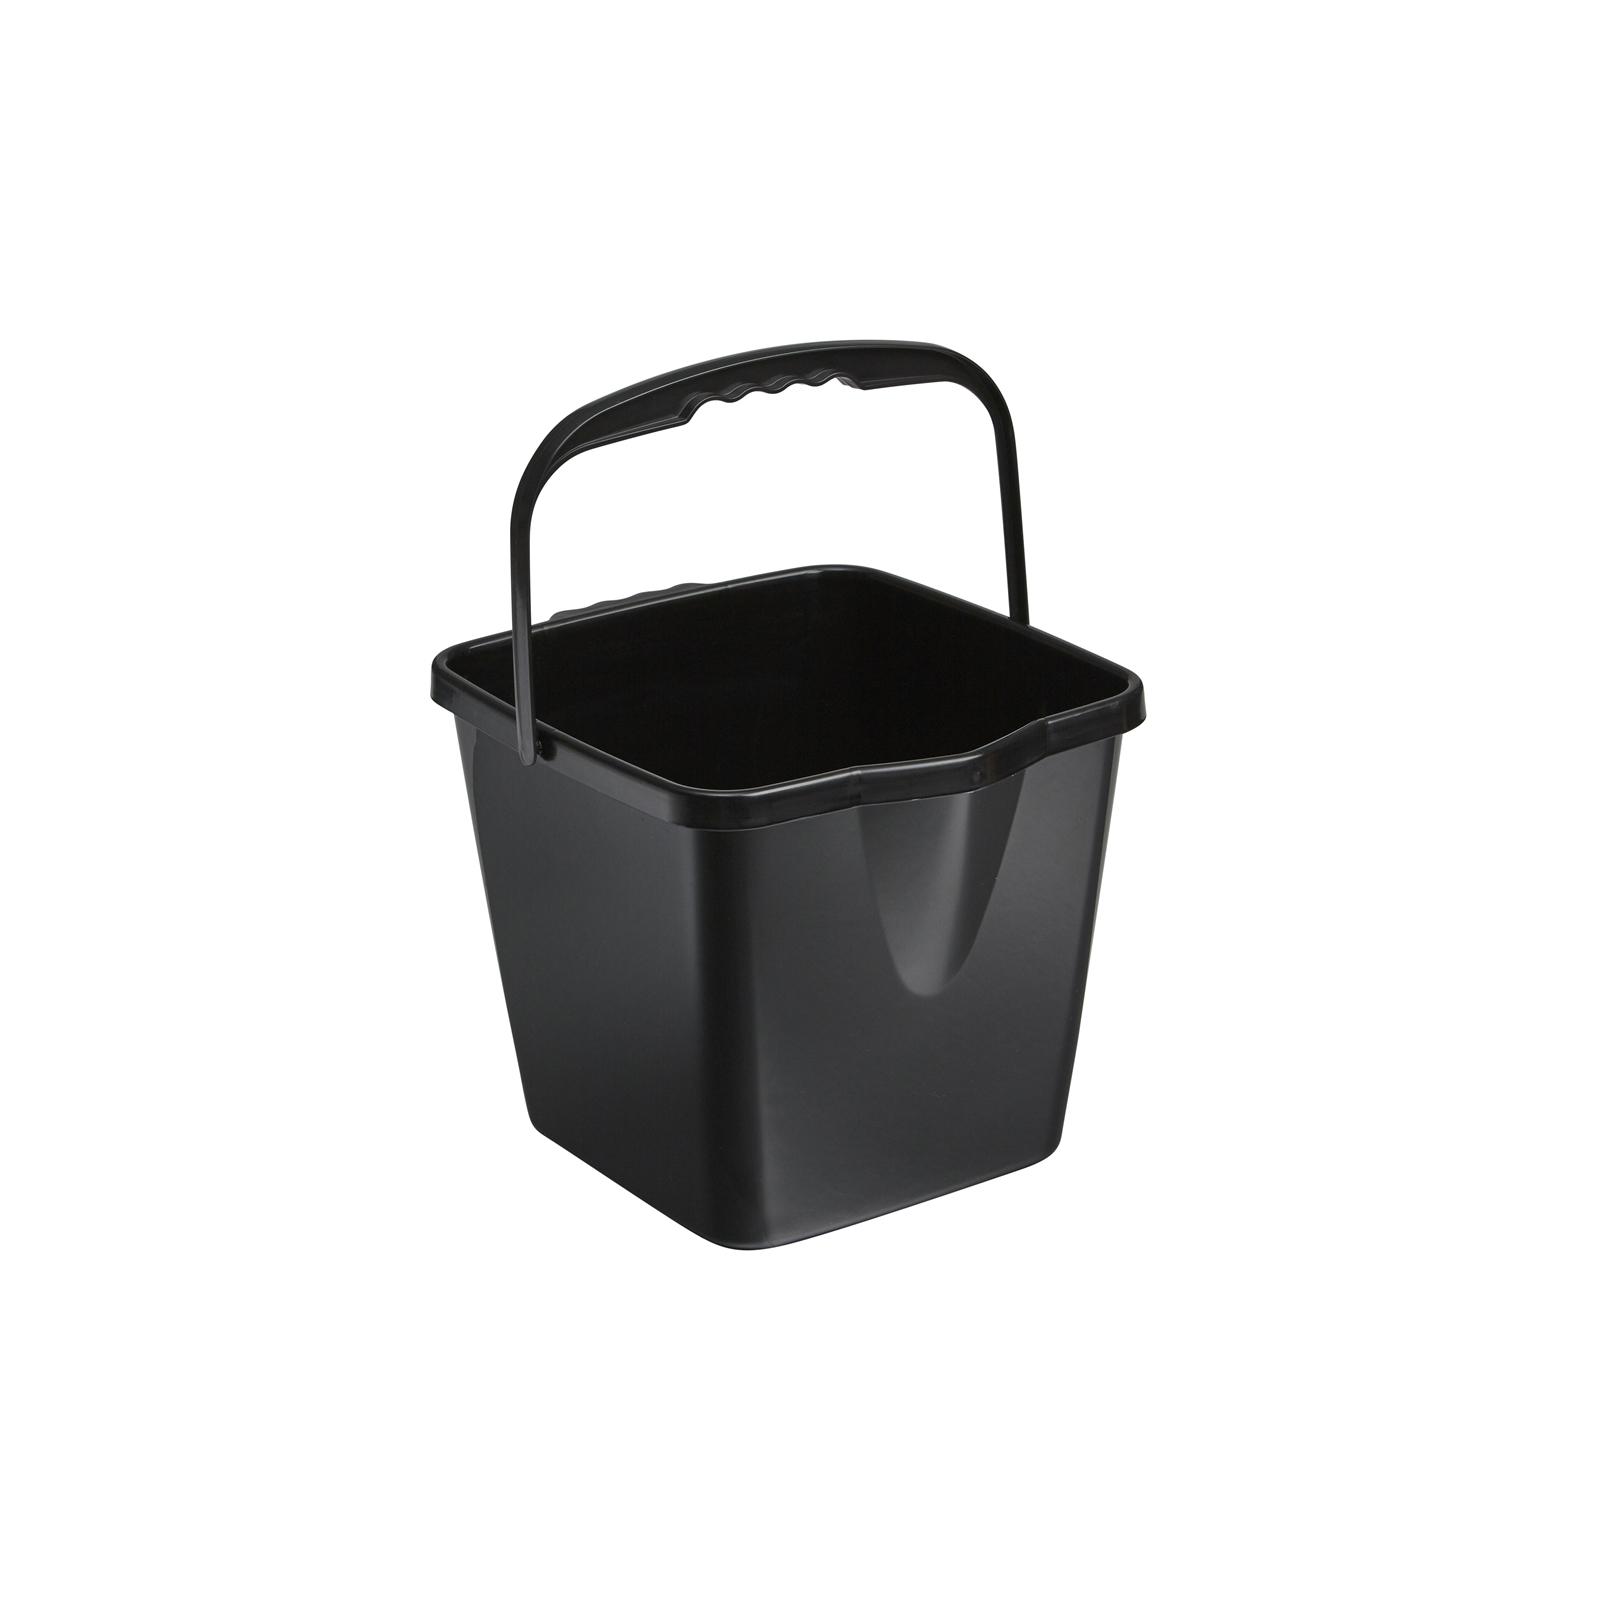 Ezy Storage 12L Square Bucket